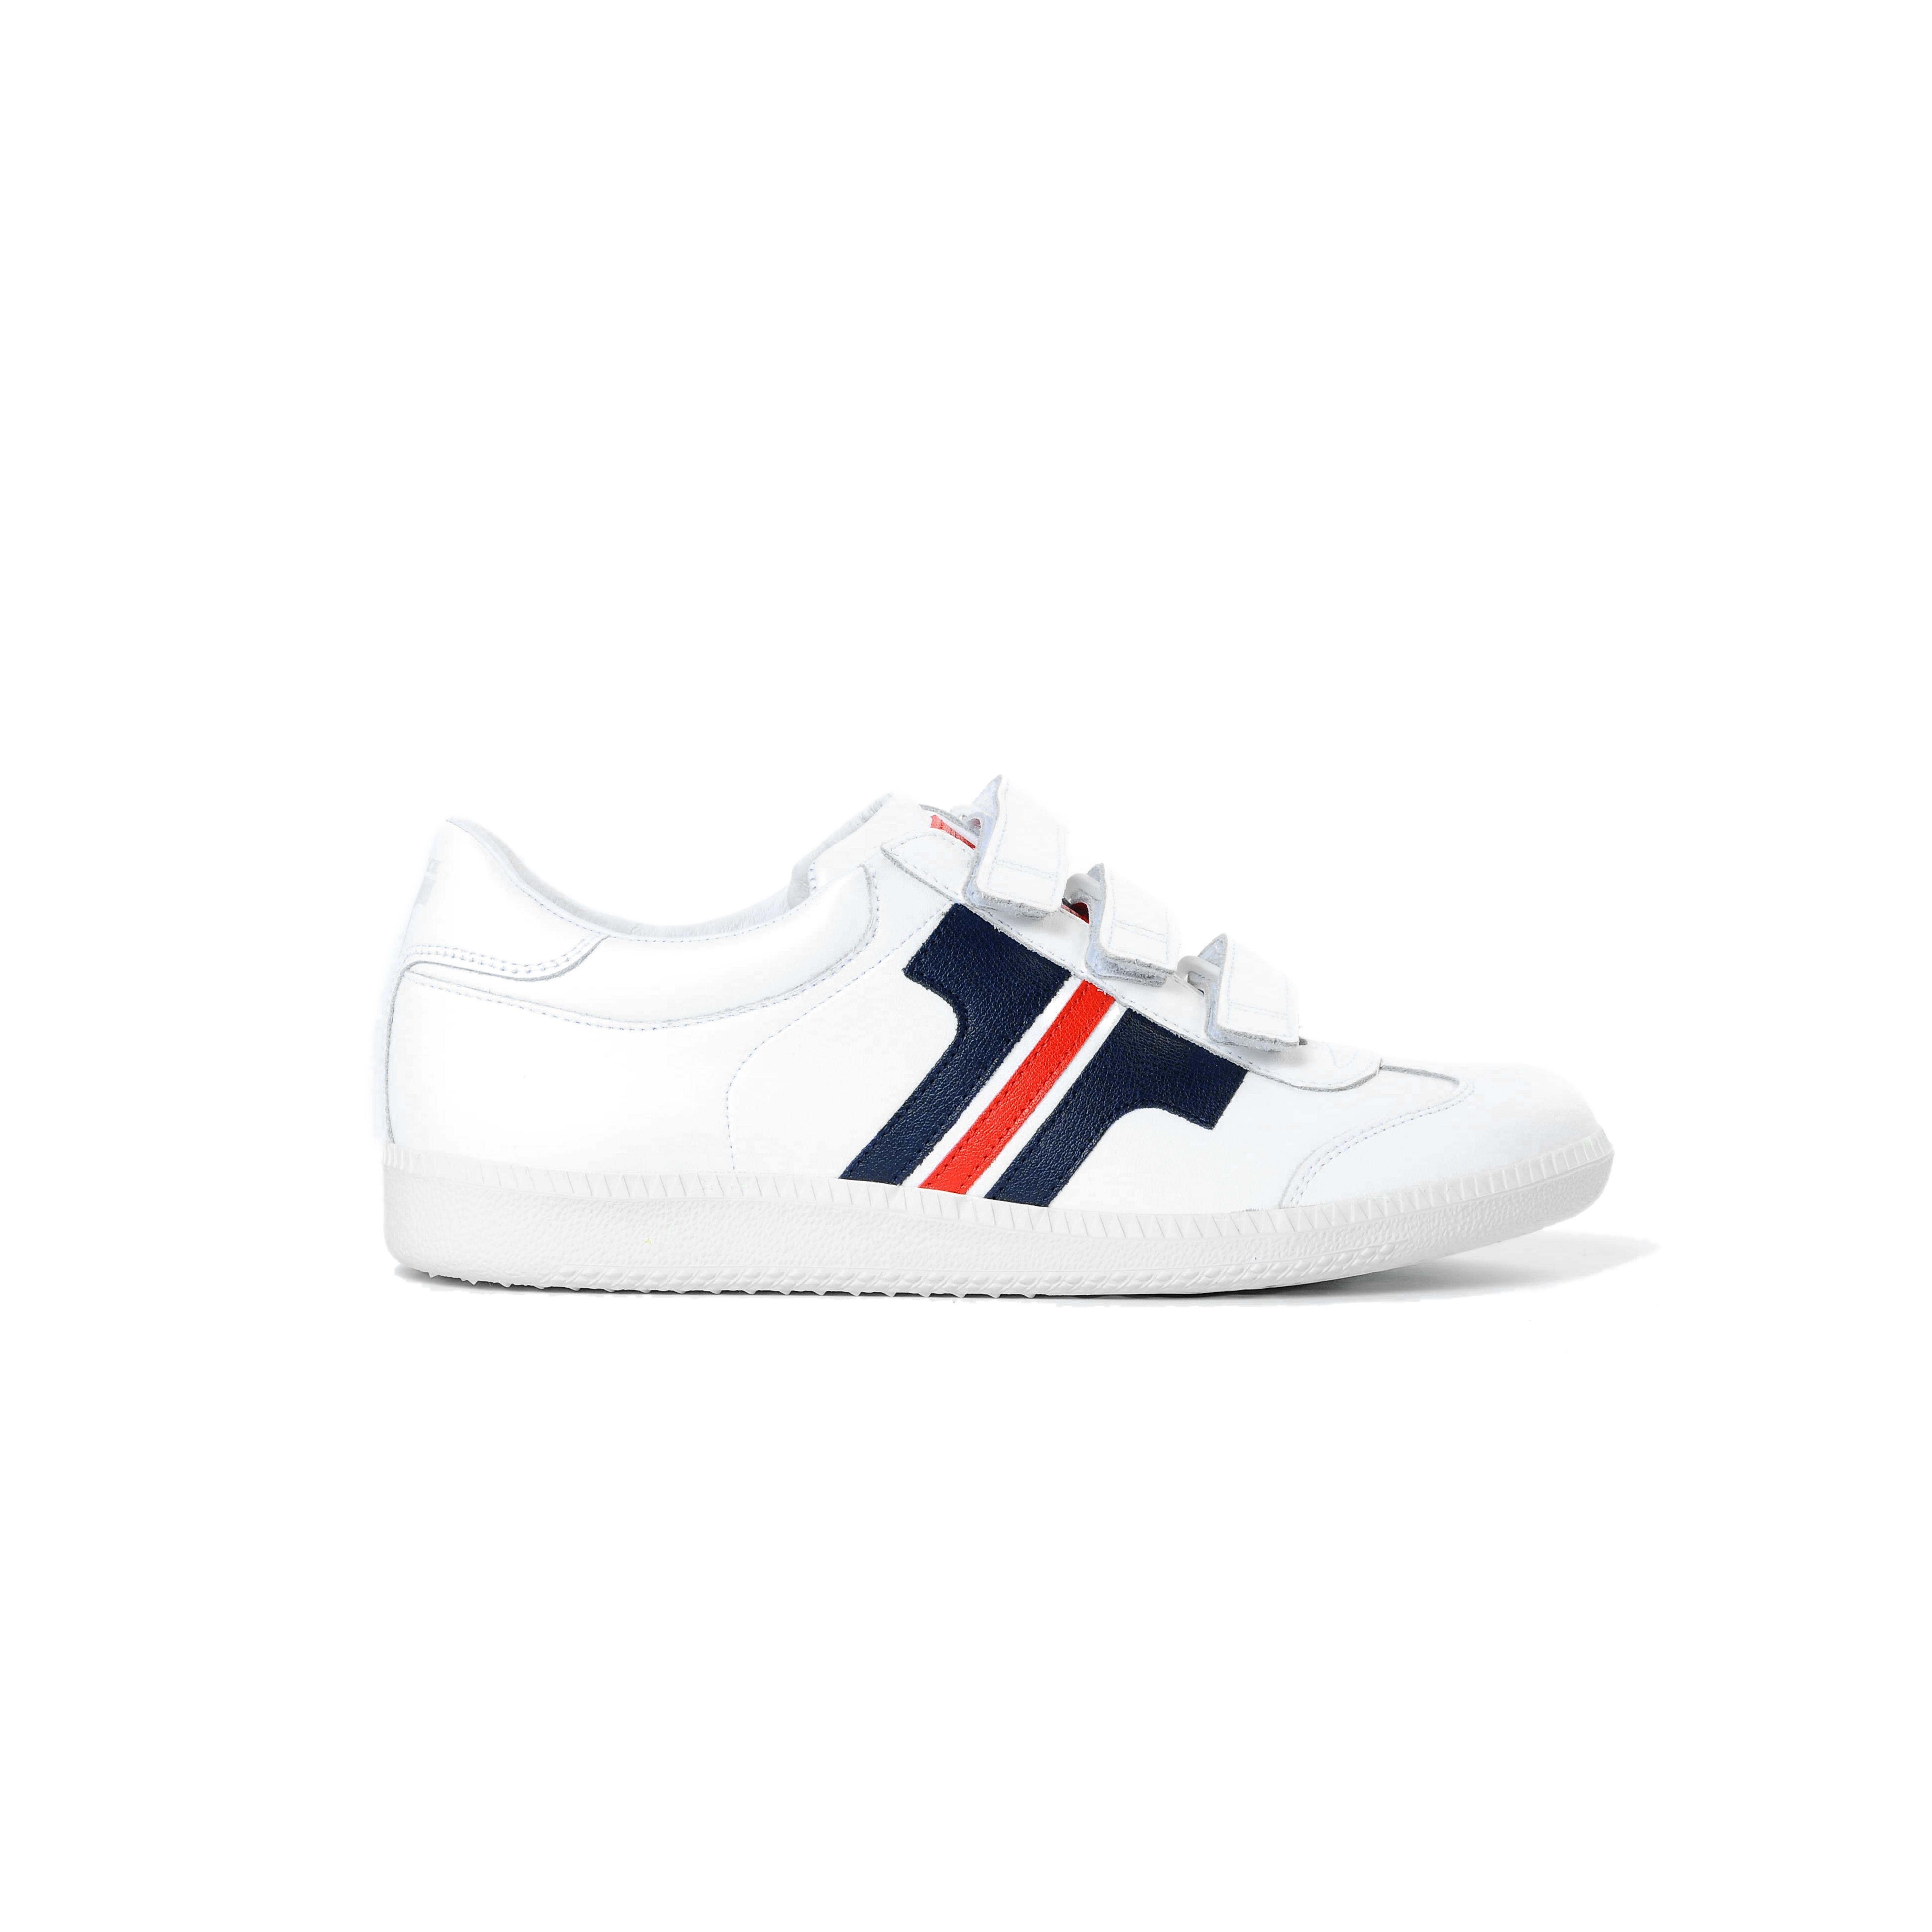 Tisza cipő - Compakt delux - Fehér-klasszik